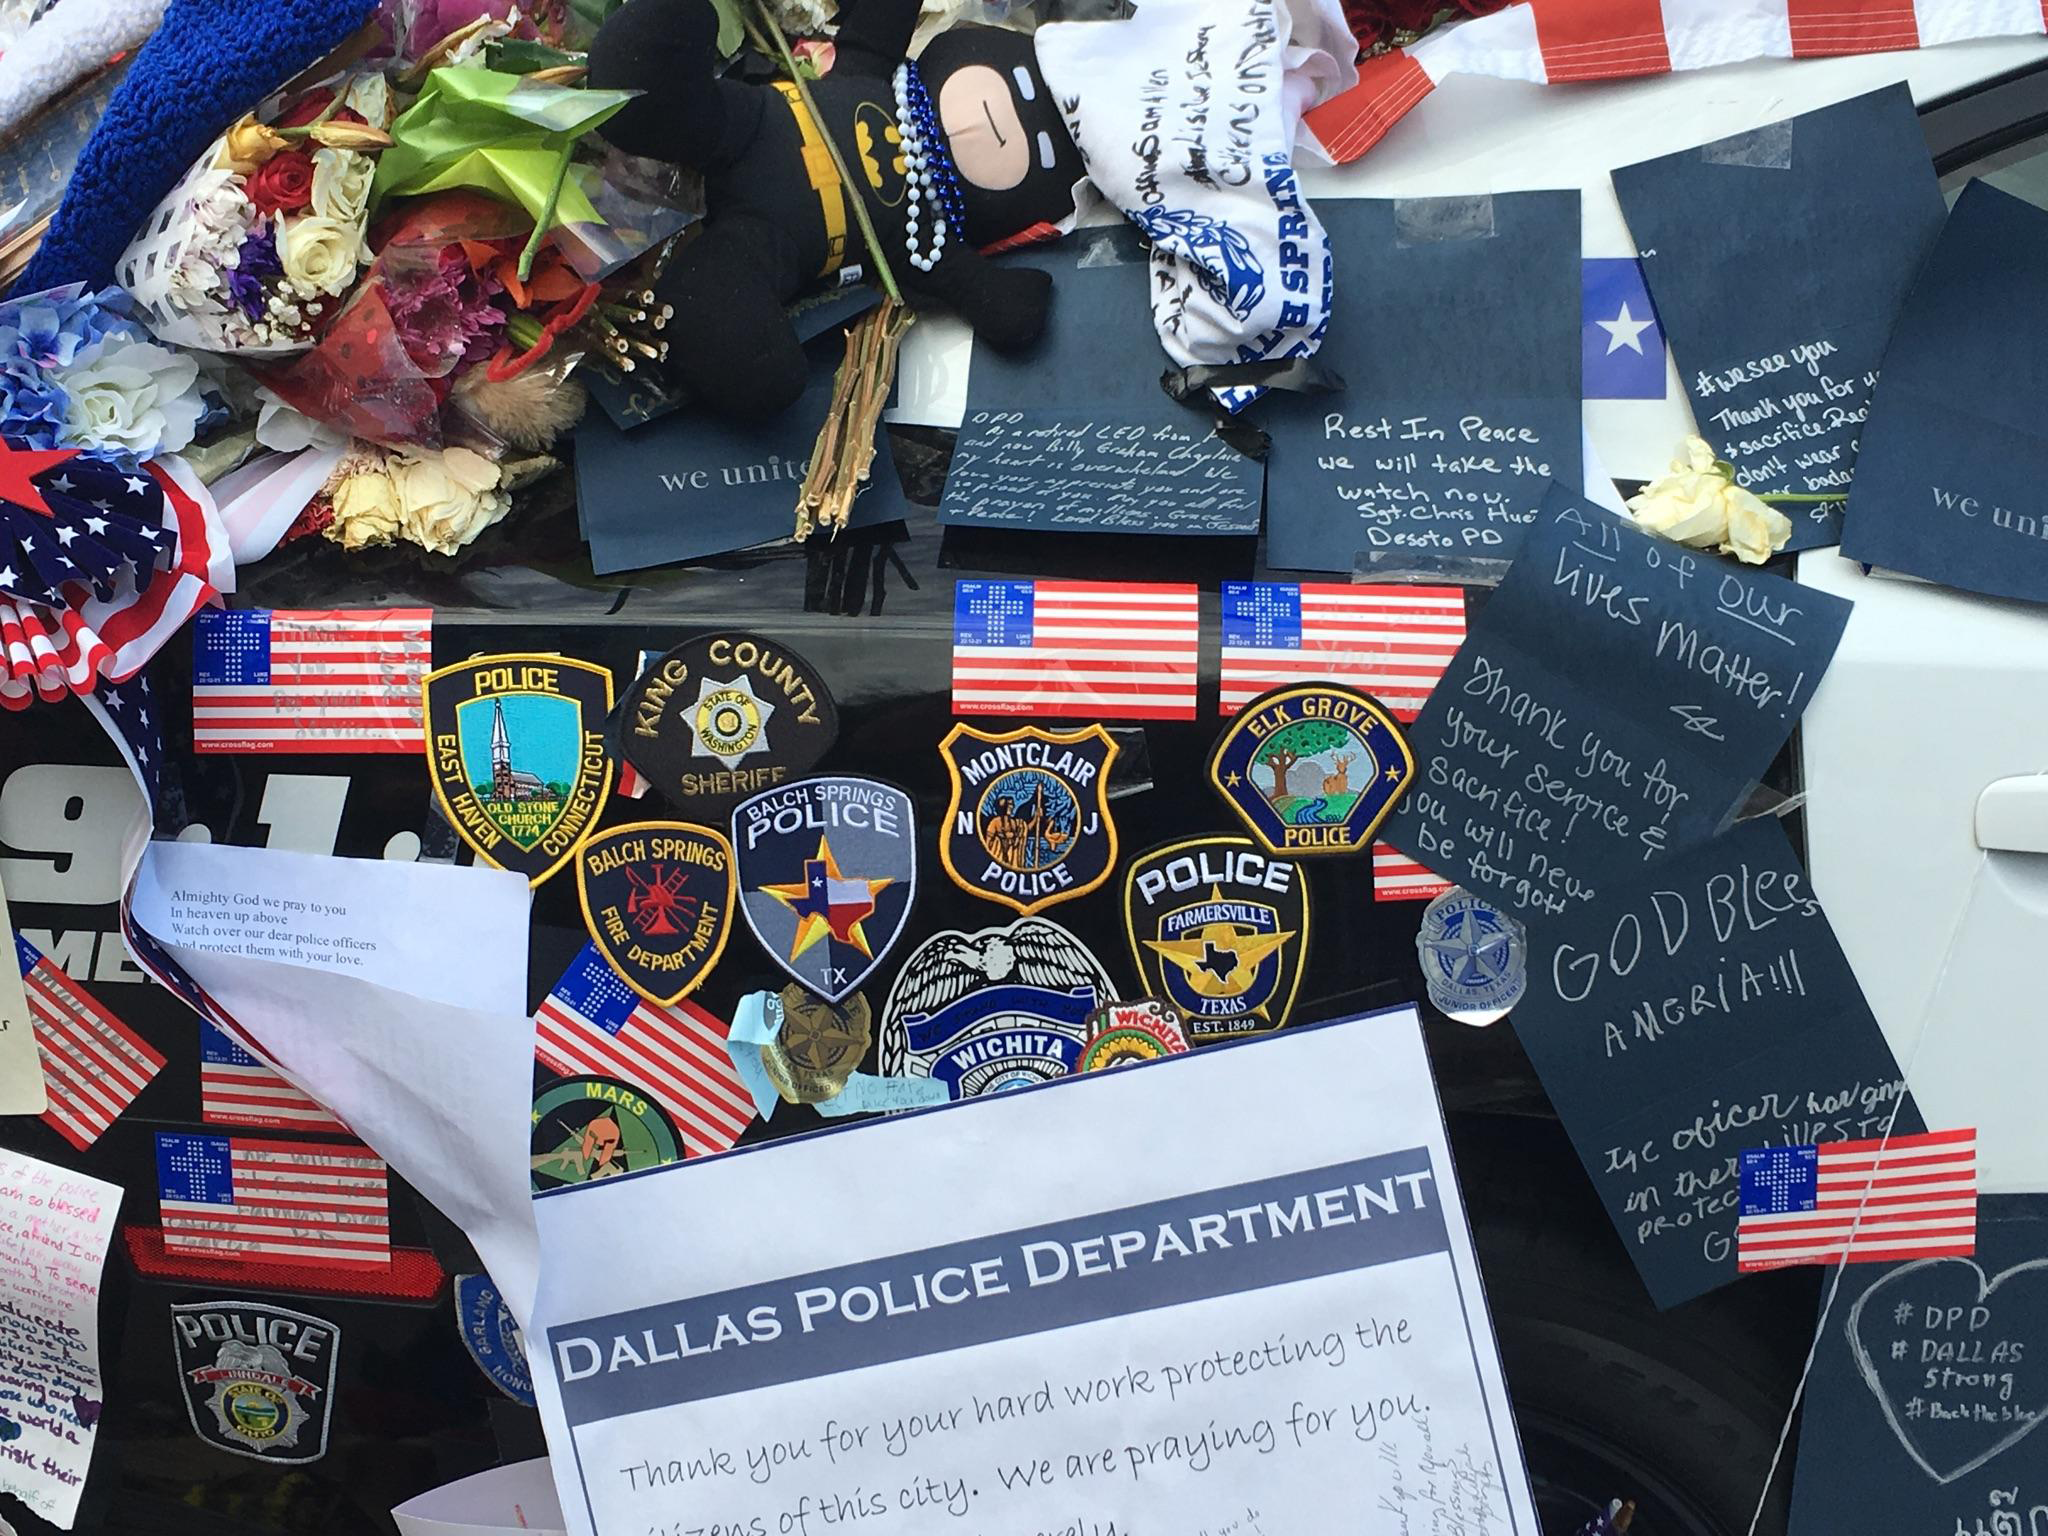 045c209875400d3edcdd_police-patches-dallas.jpg